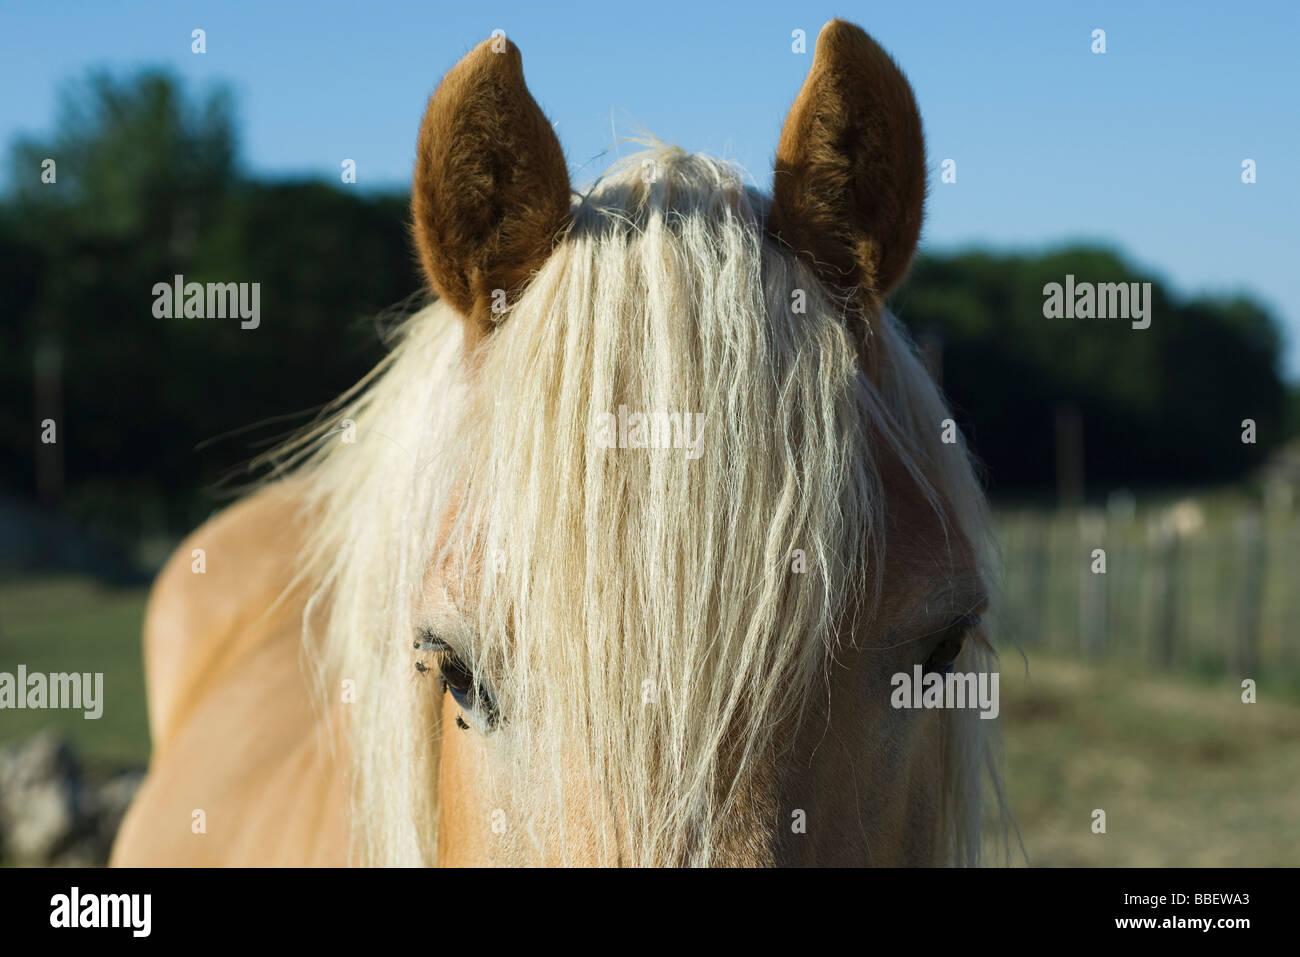 Horse with white mane, close-up - Stock Image